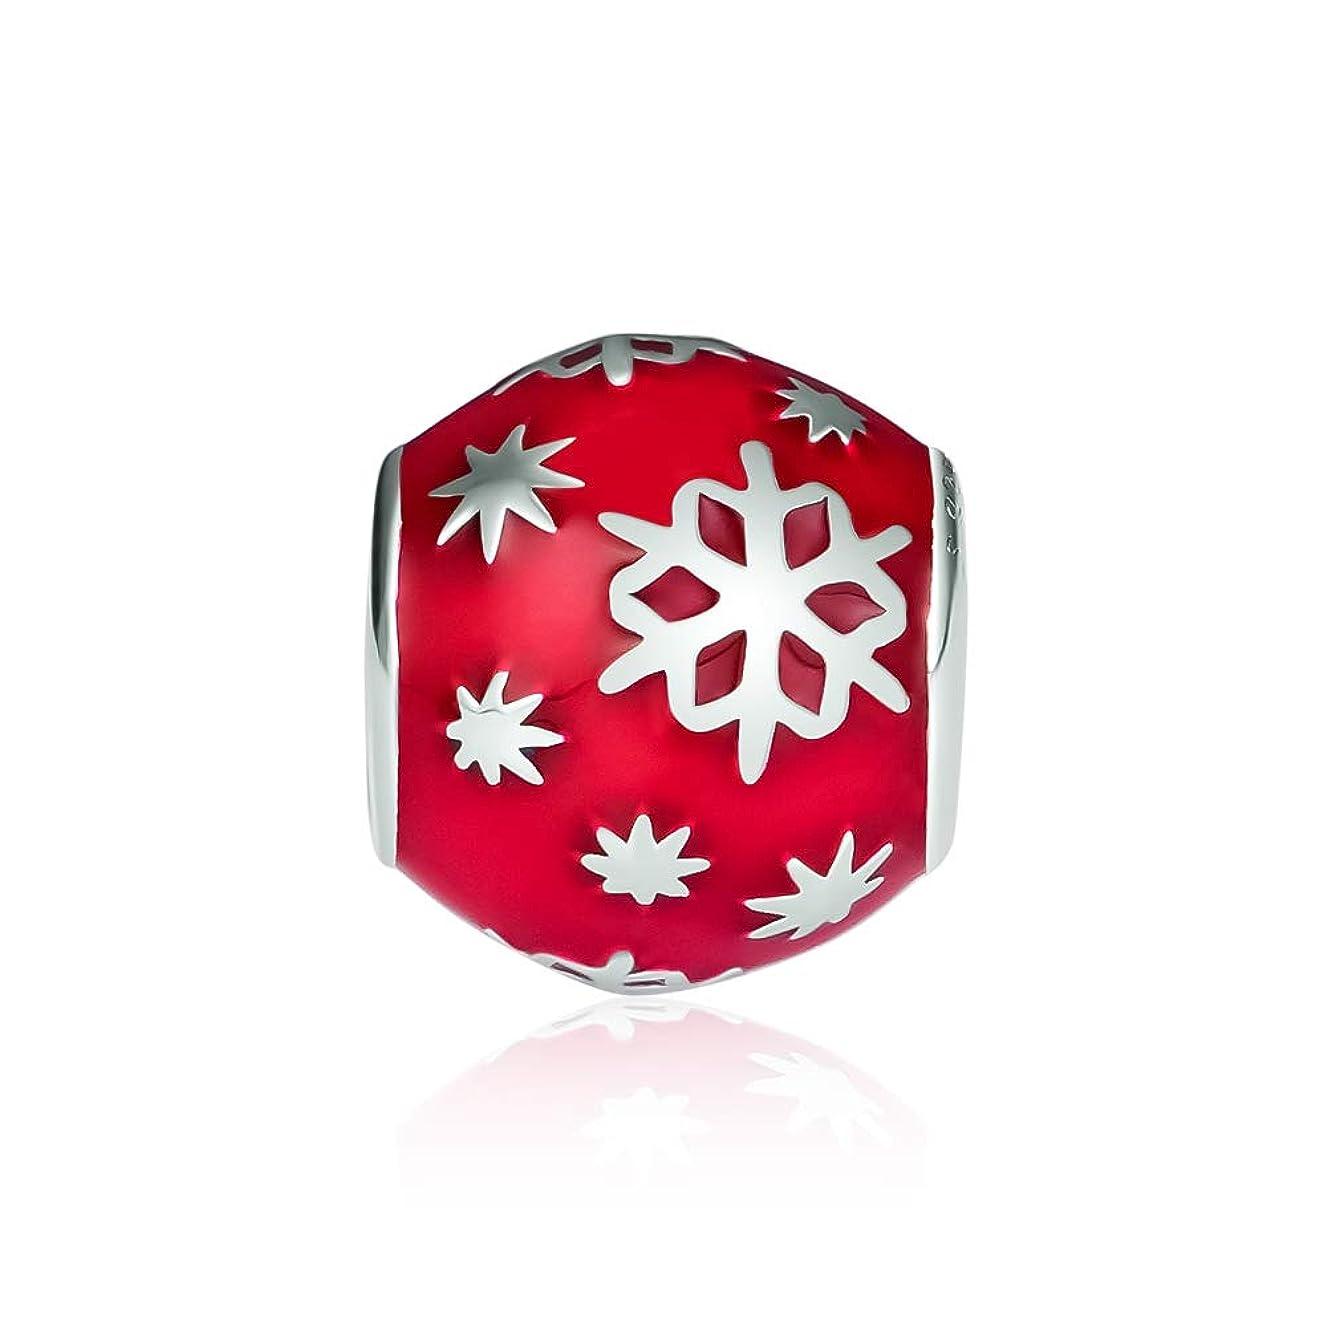 CKK Snowflake Charm Fit Pandora Bracelet 925 Sterling Silver Red Enamel Bead Charms for Bracelets DIY Jewelry Making Christmas Gift